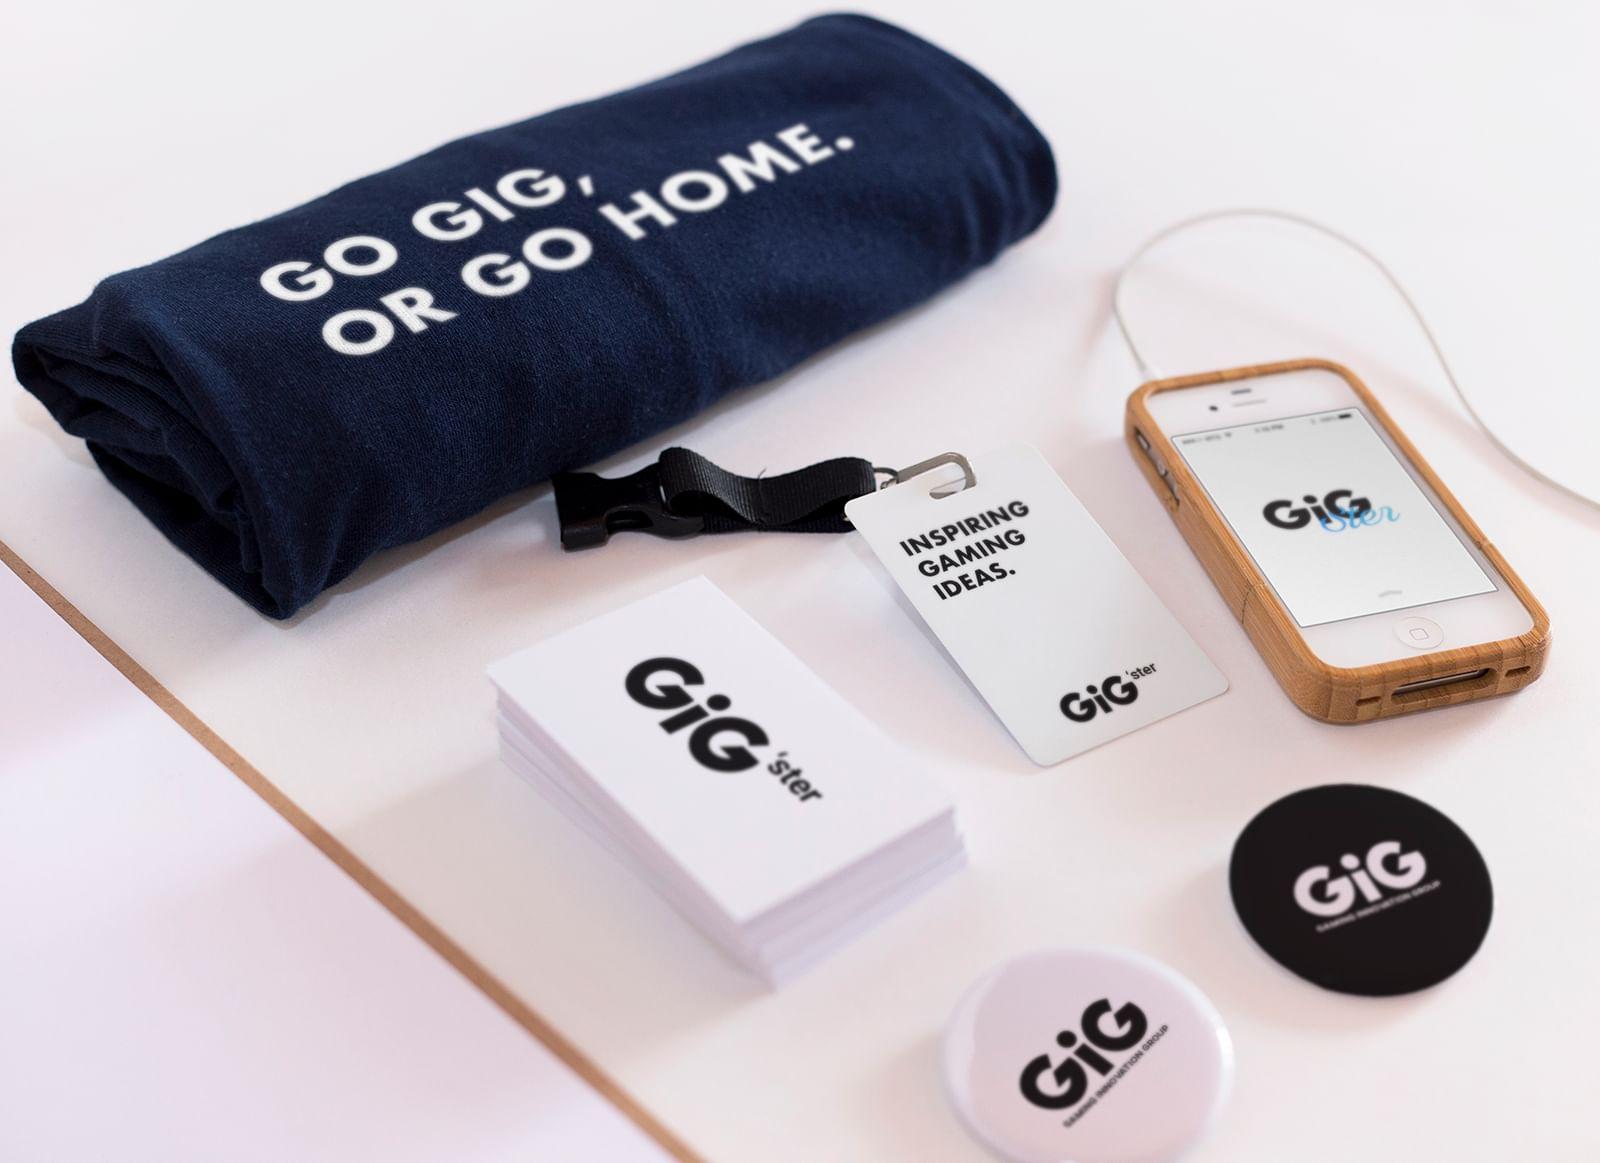 GiG branding peripherals